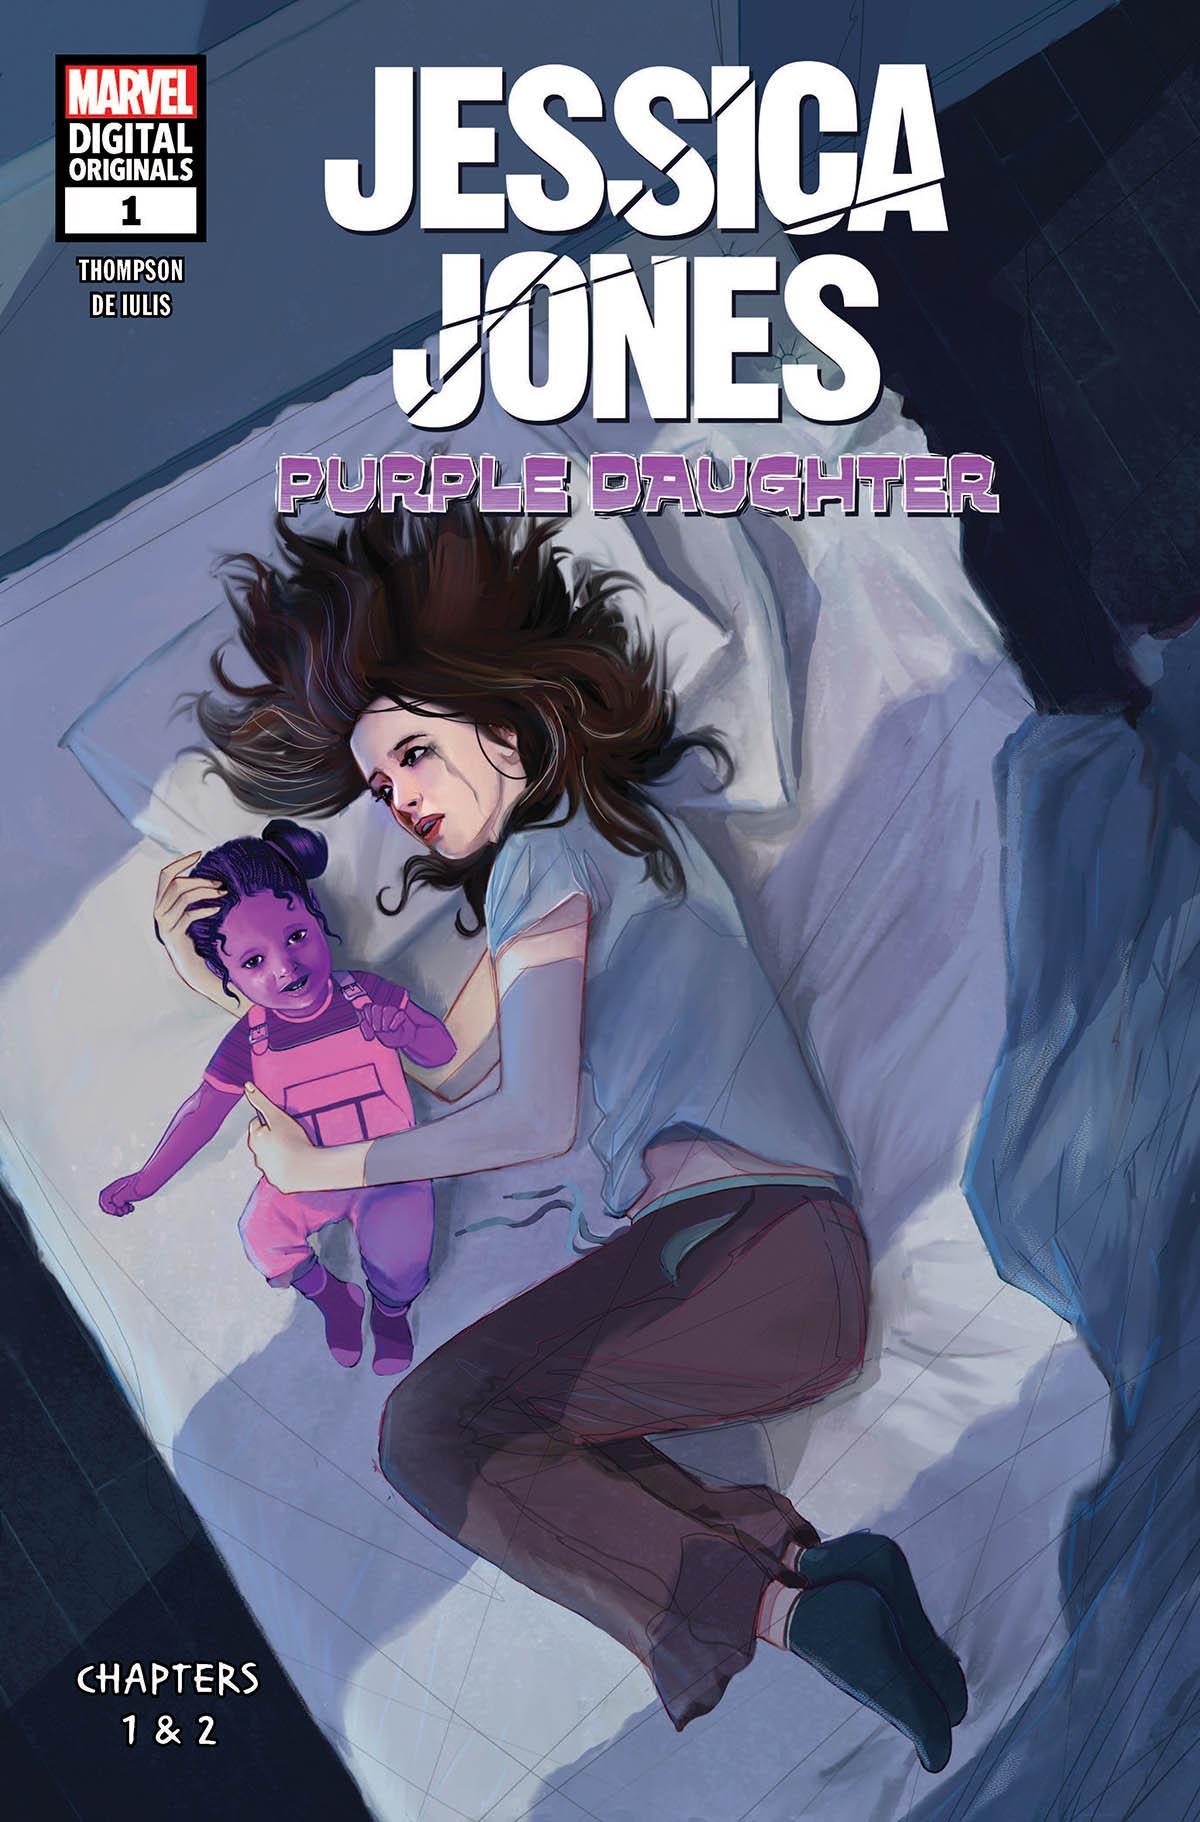 Jessica Jones - Marvel Digital Original: Purple Daughter (2019) #1